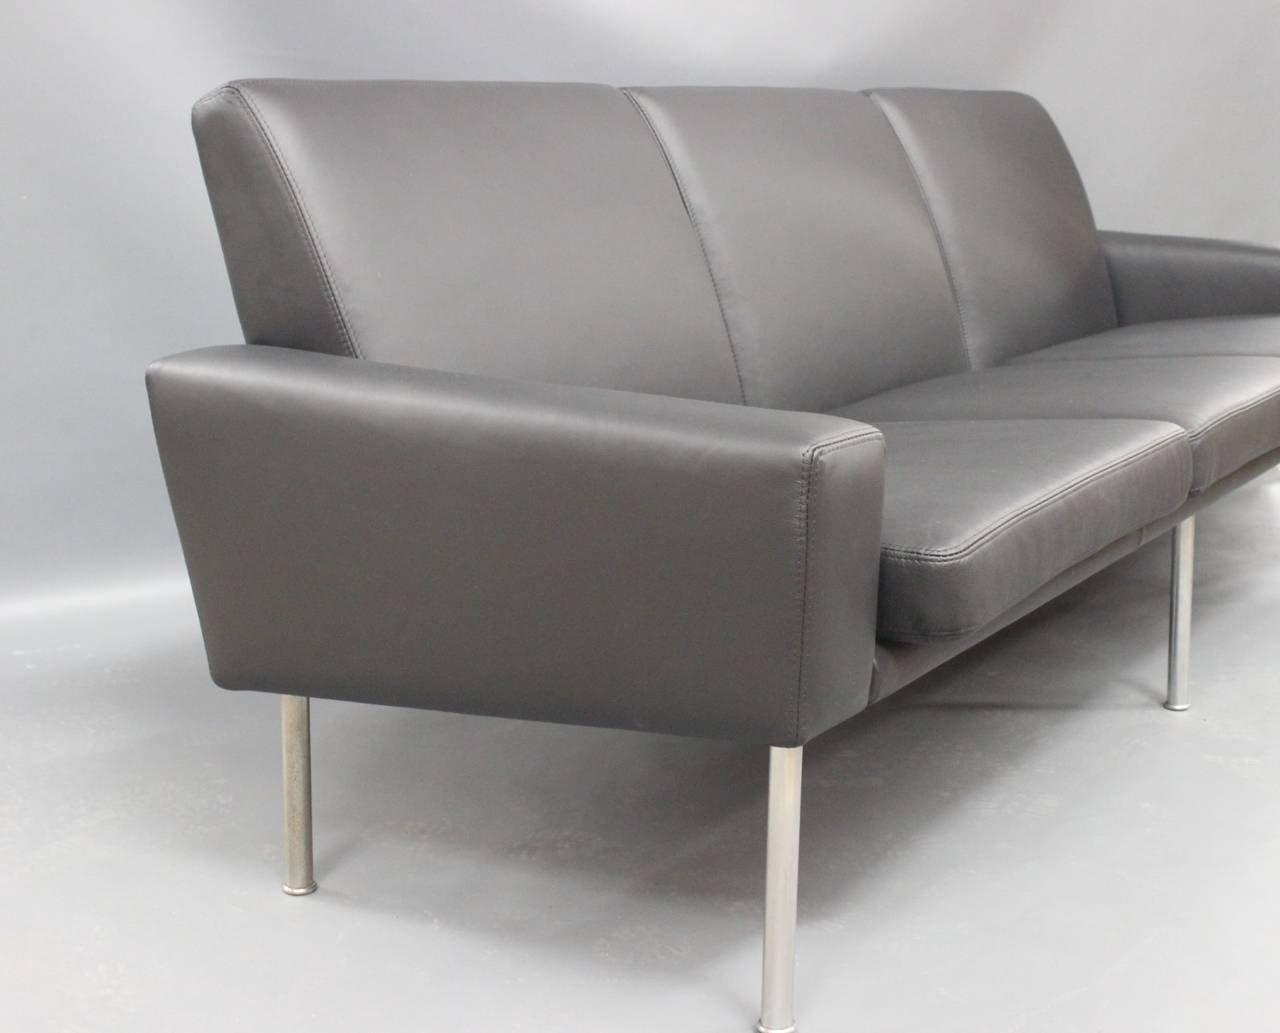 model 34 3 3 seater sofa by hans j wegner 1960 for sale at pamono. Black Bedroom Furniture Sets. Home Design Ideas